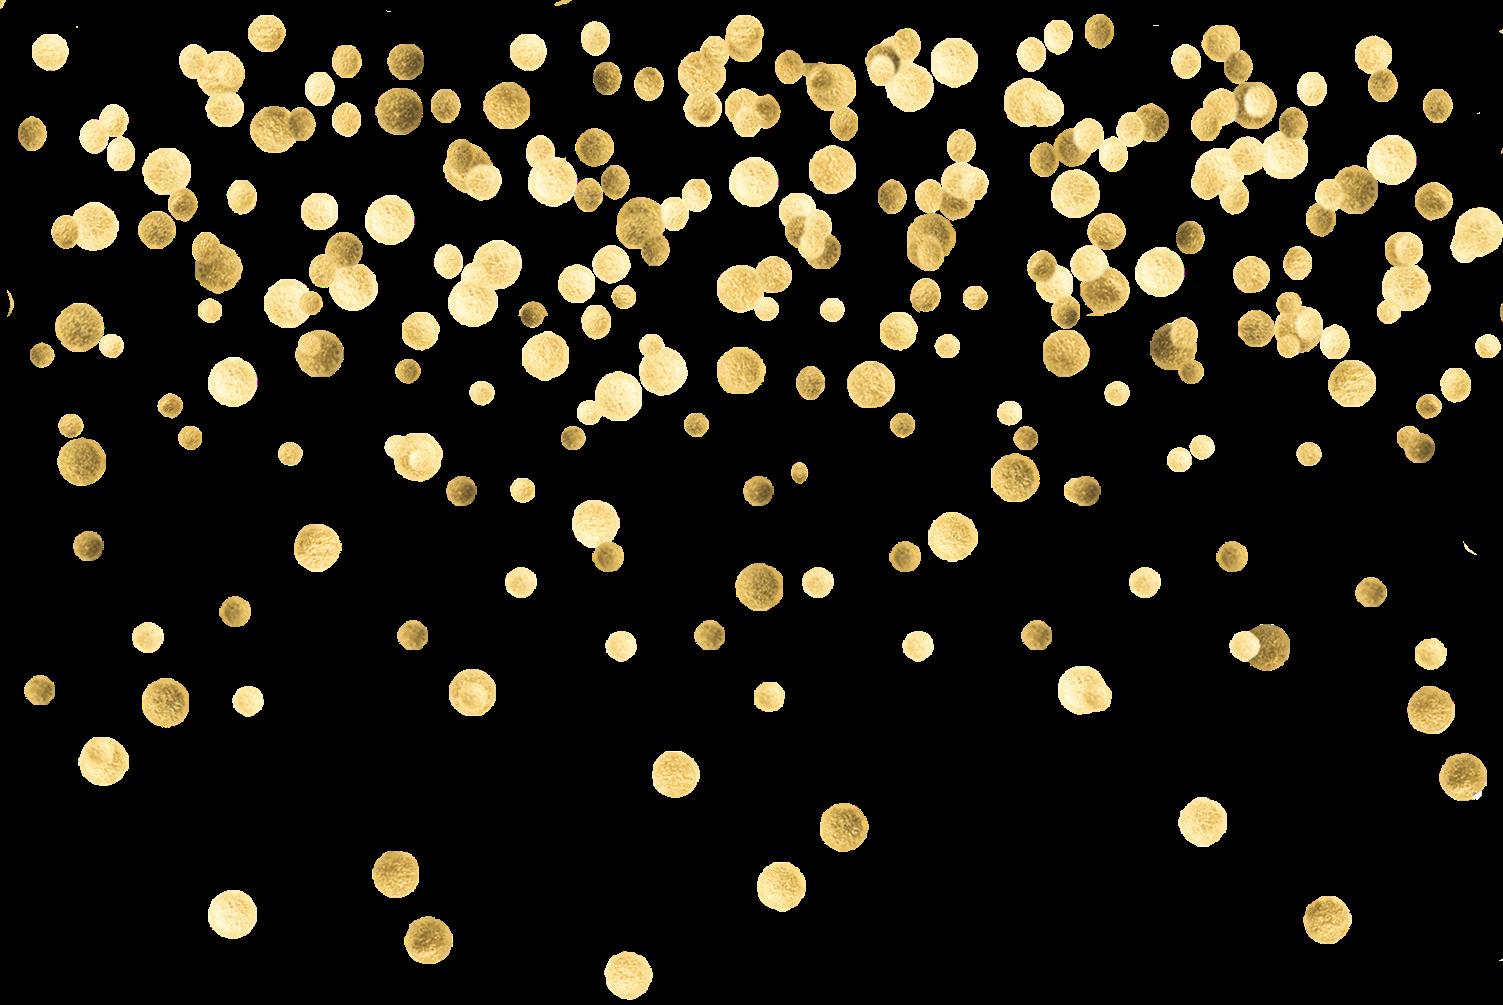 jpg freeuse confetti gold goldconfetti sparkle overlay freetoedit